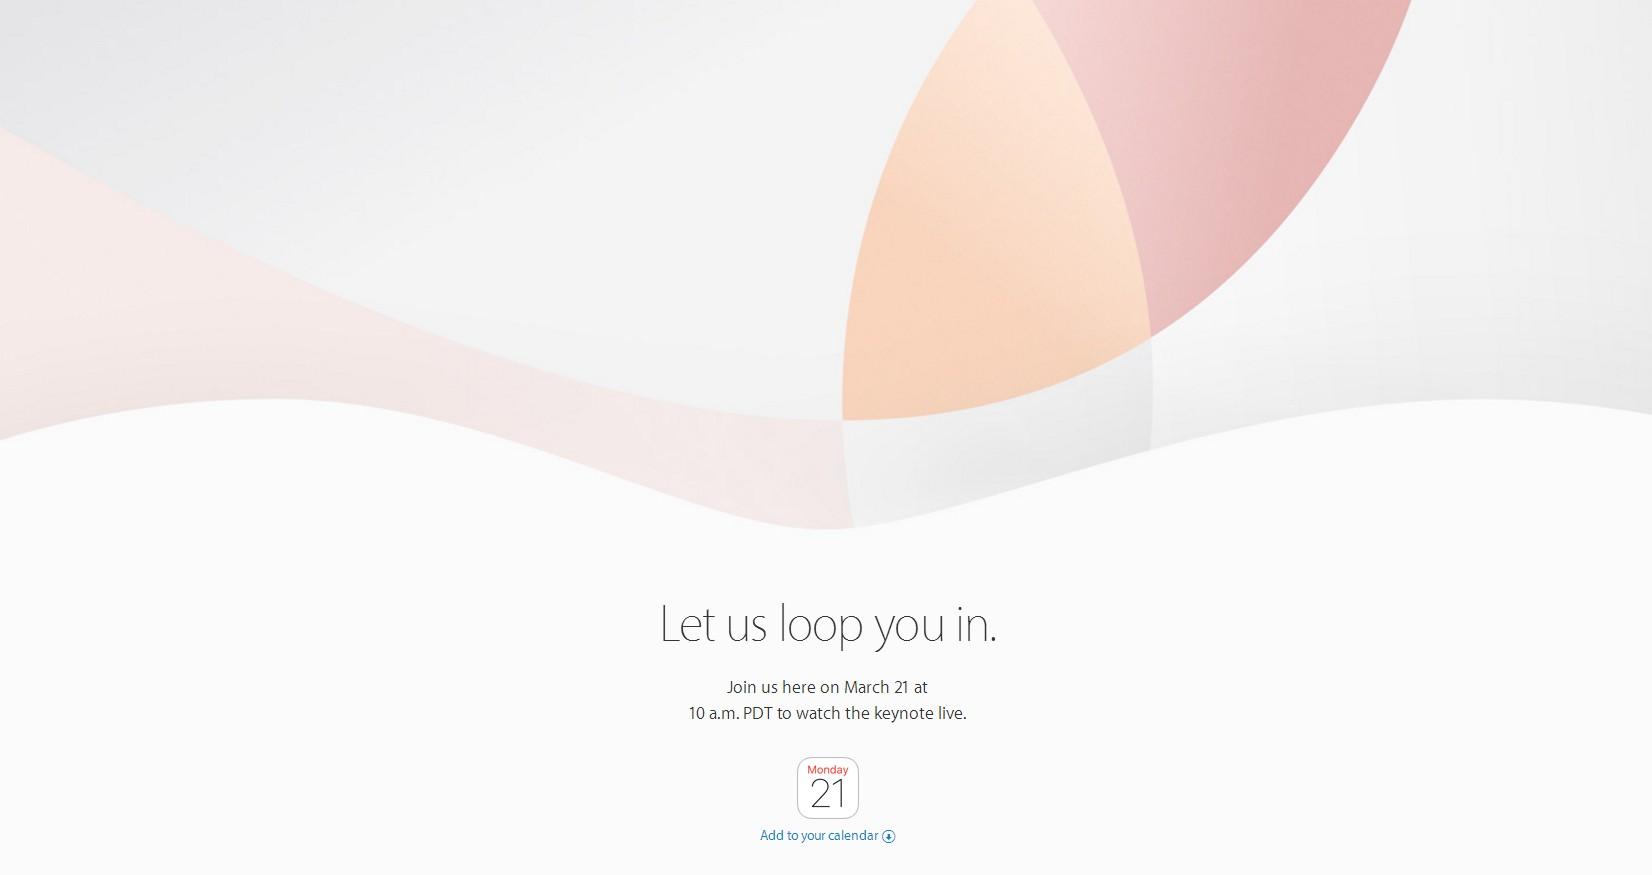 Apple 2016 春季發表會圖文直播,完全在這場發表會全部揭曉,Apple Watch2將到來 - 瘋先生